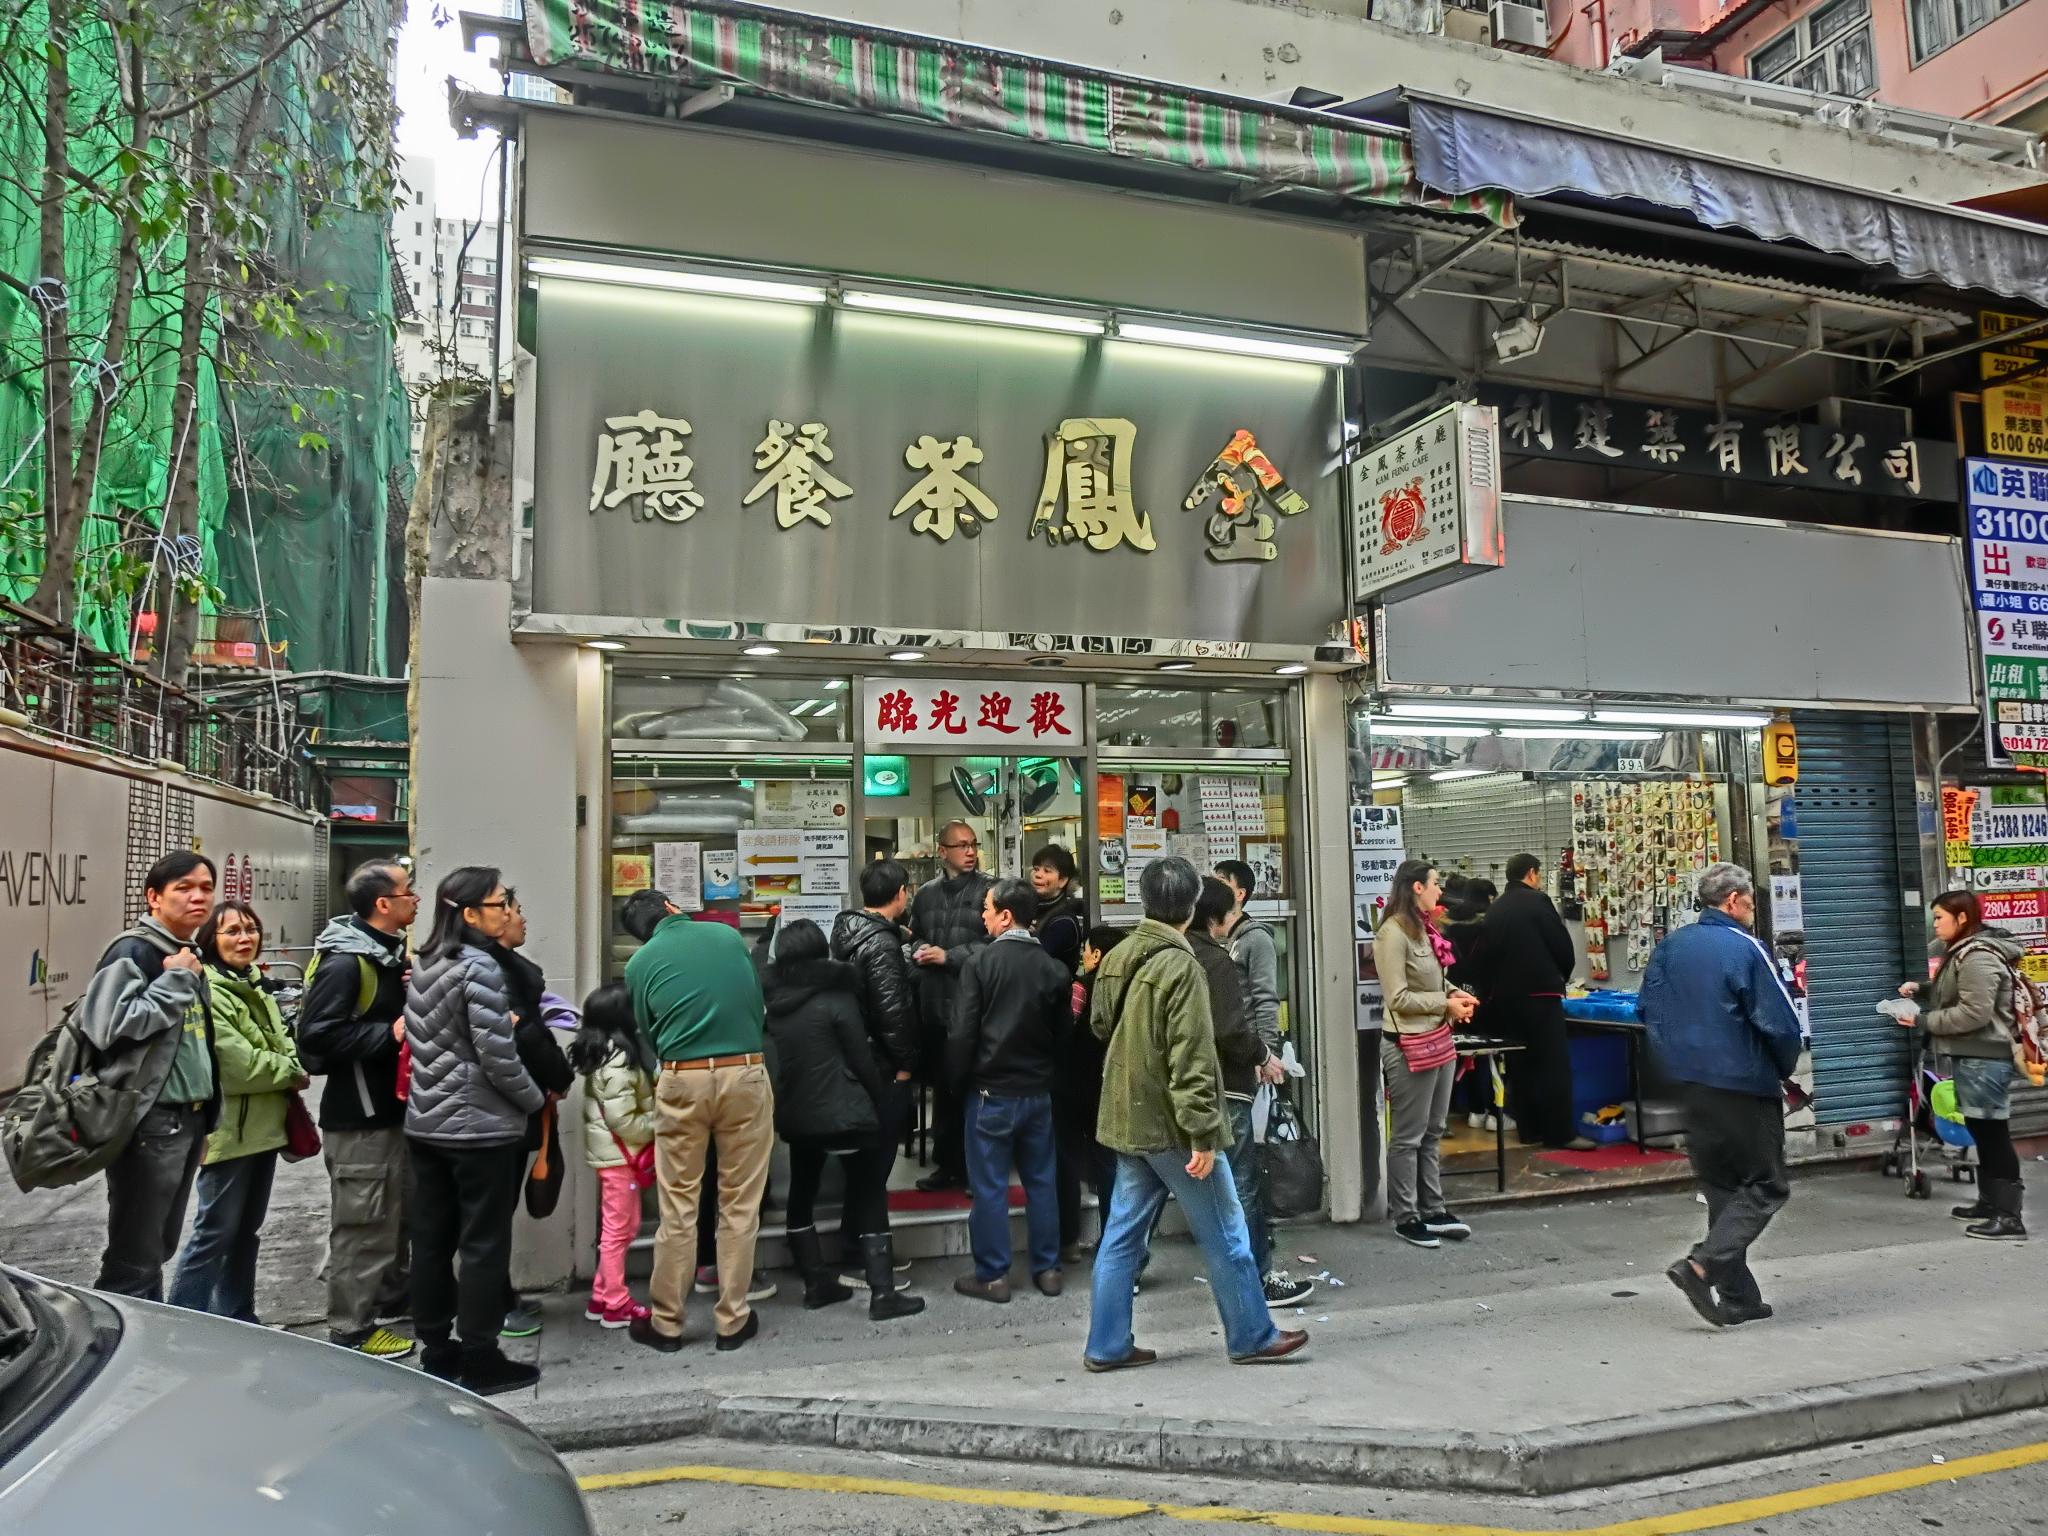 File:HK 灣仔 Wan Chai 春園街 Spring Garden Lane sidewalk shop 金鳳茶餐廳 Kam Fung Cafe queue visitors Dec-2013.JPG - Wikimedia Commons